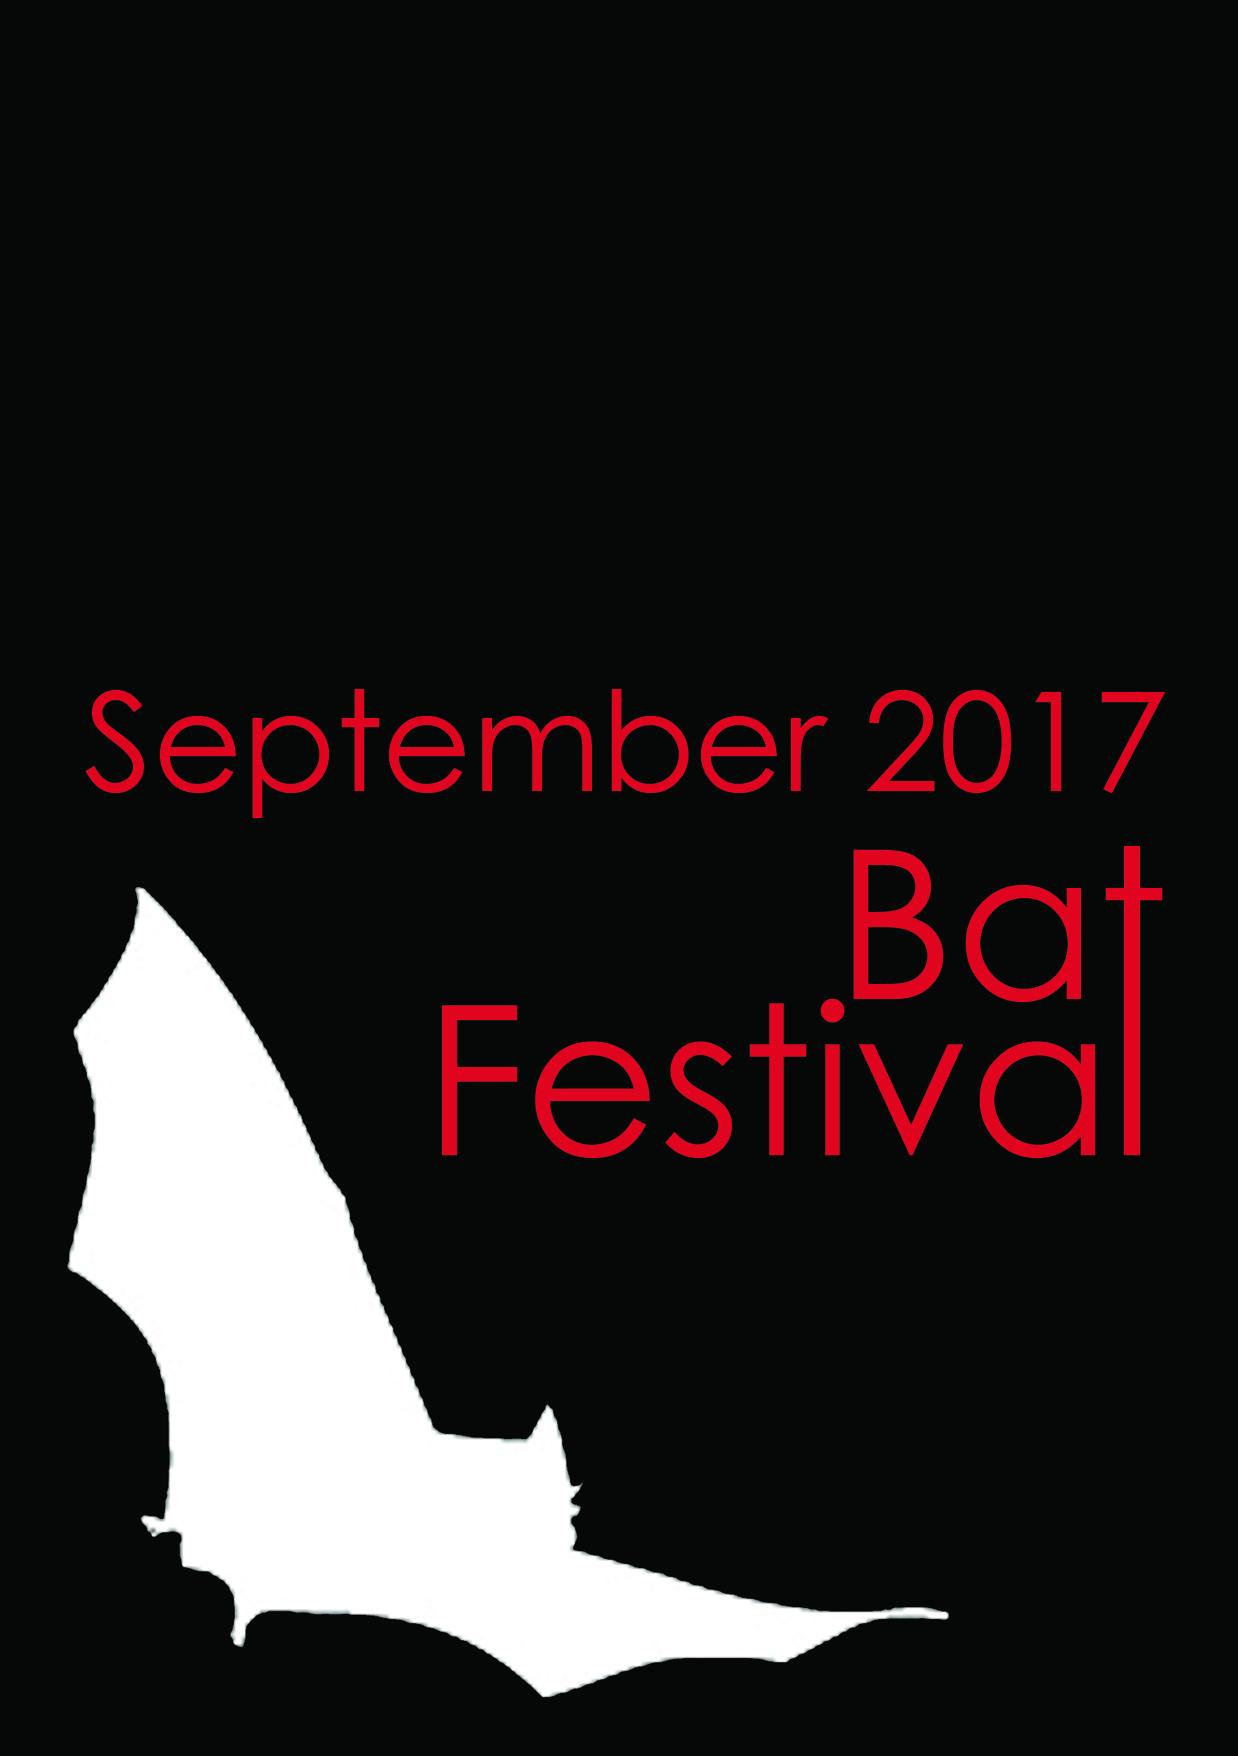 Bat Festival 2017 logo